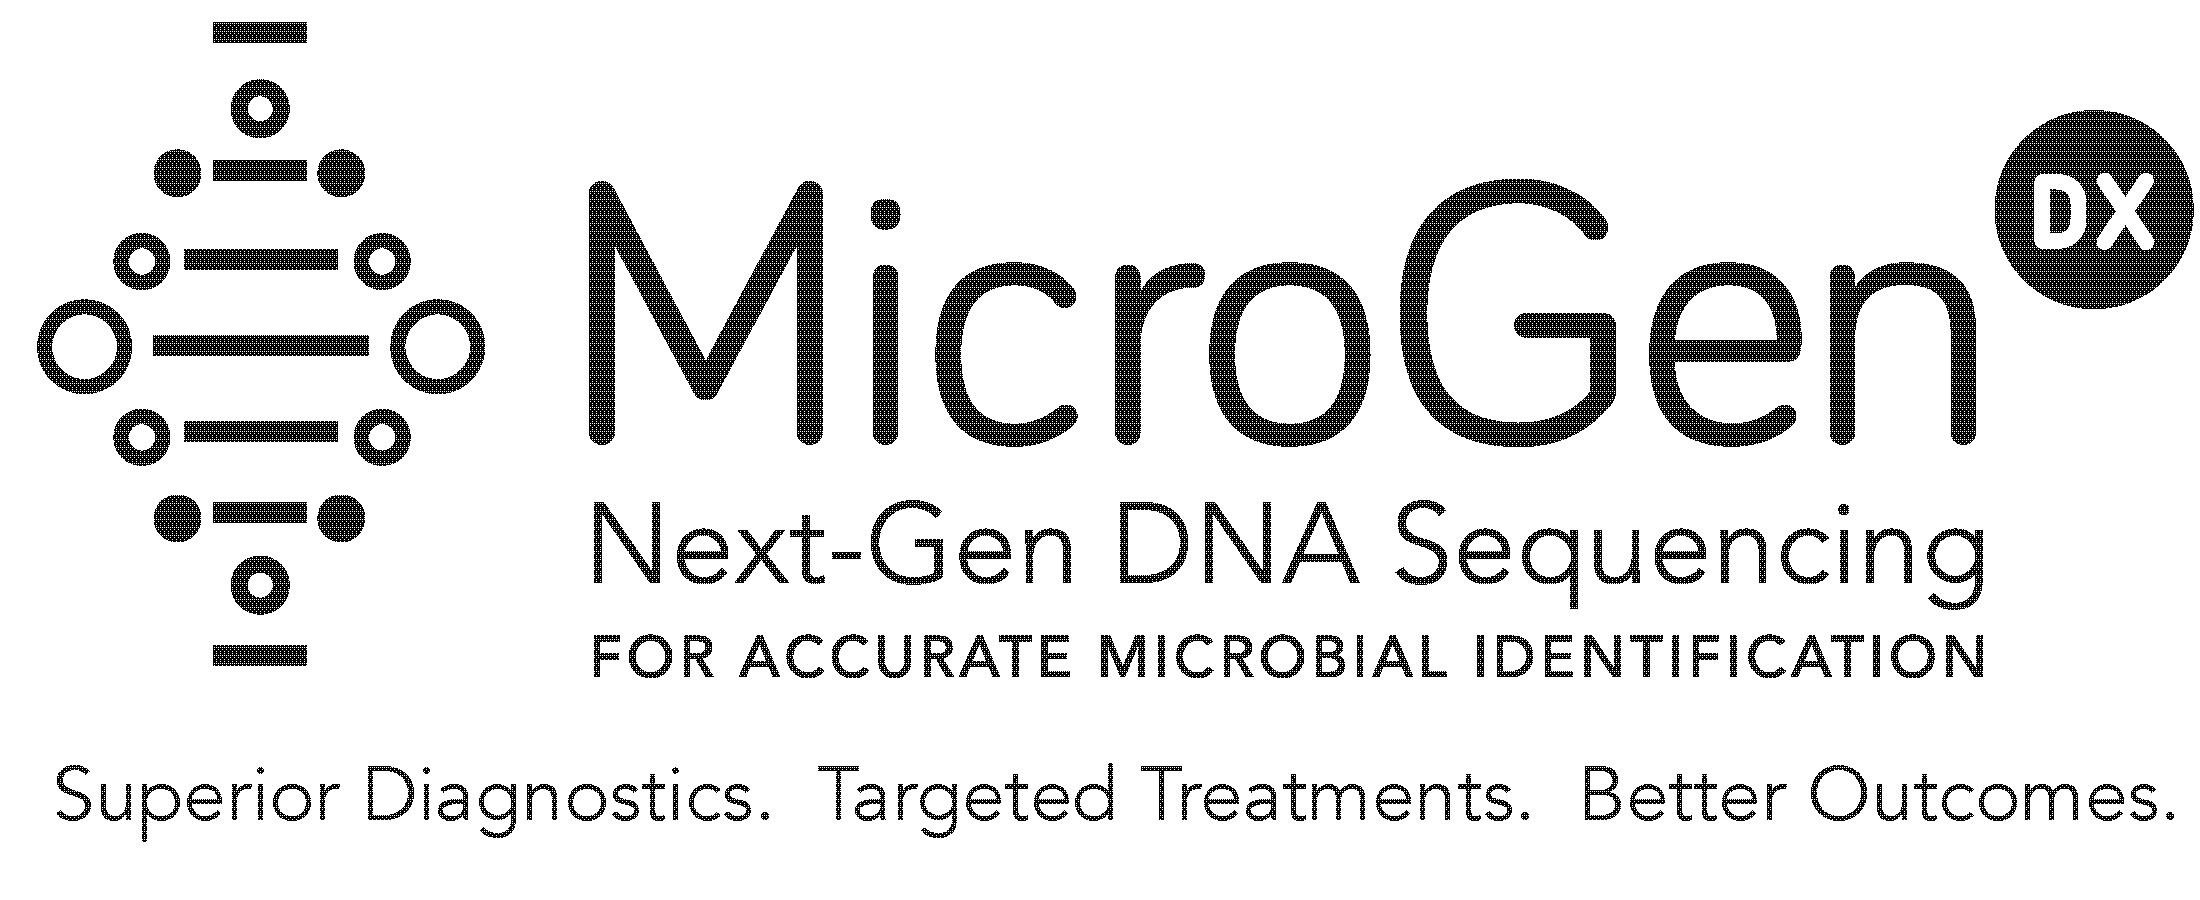 MGDX-Logo-Next-Gen-Accurate-Sup-Targ-Better-2018-BW